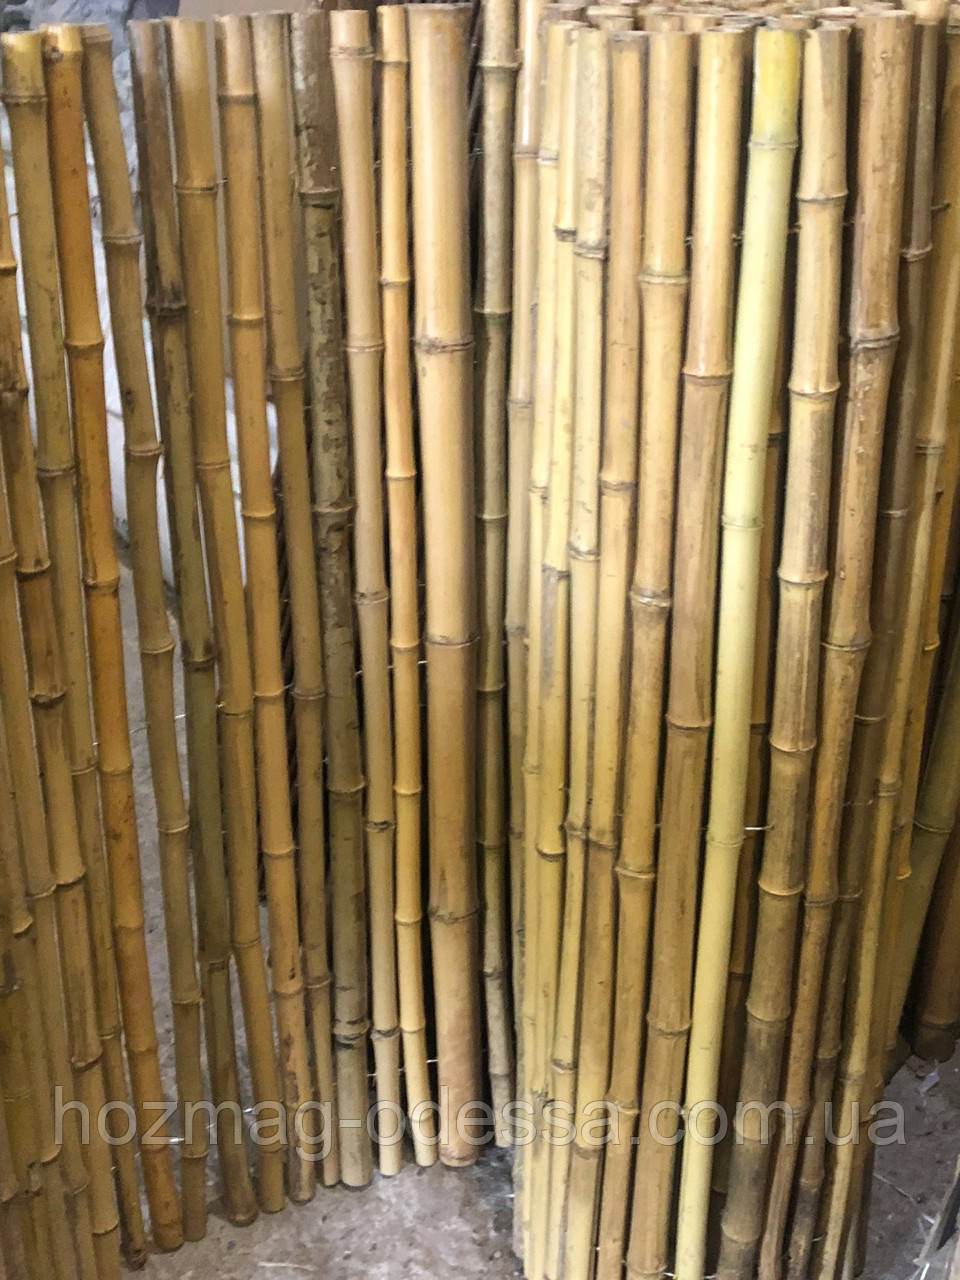 Забор бамбуковый 1,5 м *3,0 м.